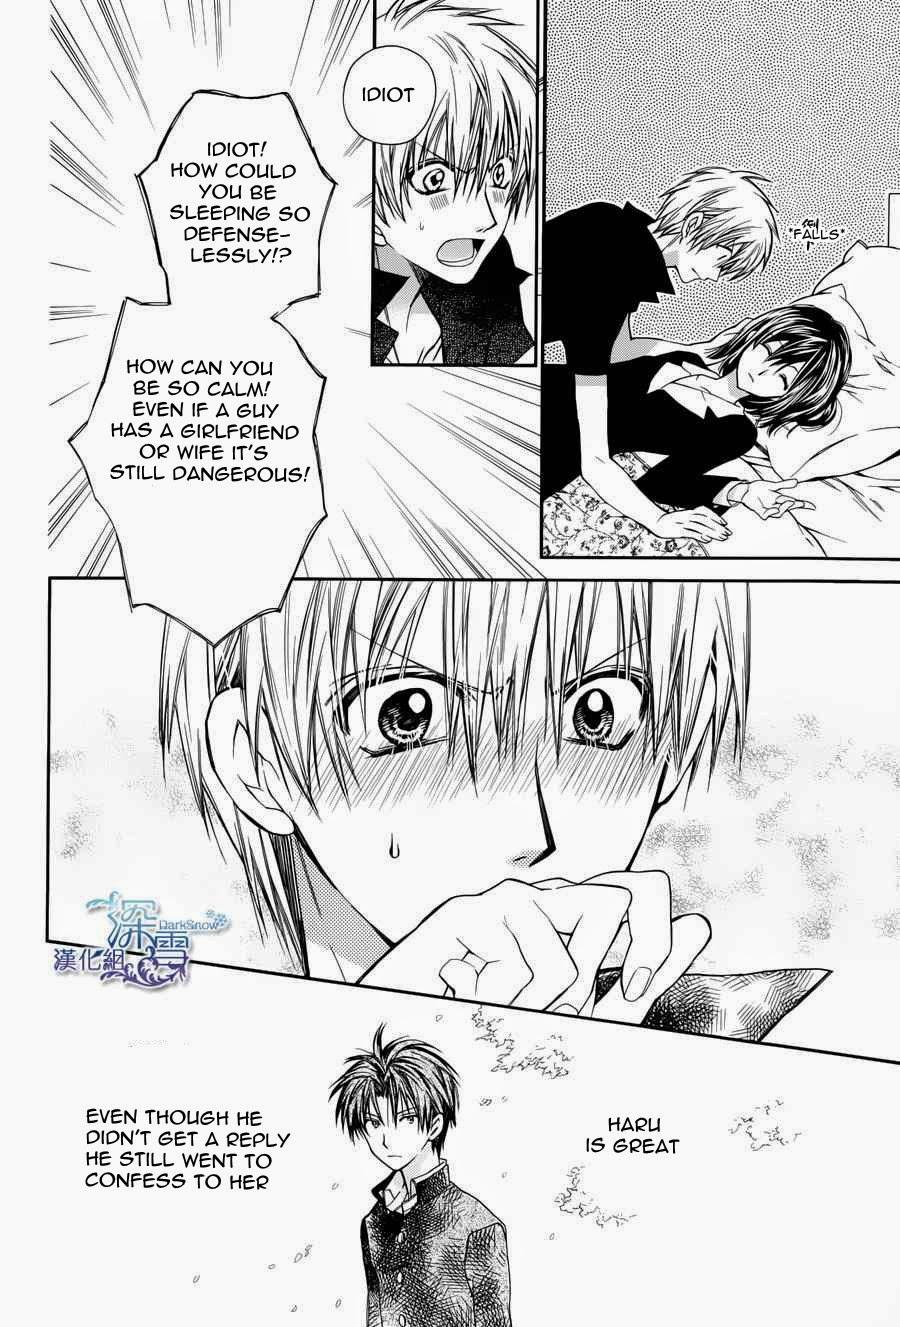 Read manga 31 Ai Dream Vol.001 Ch.003: Episode 003 online in high quality